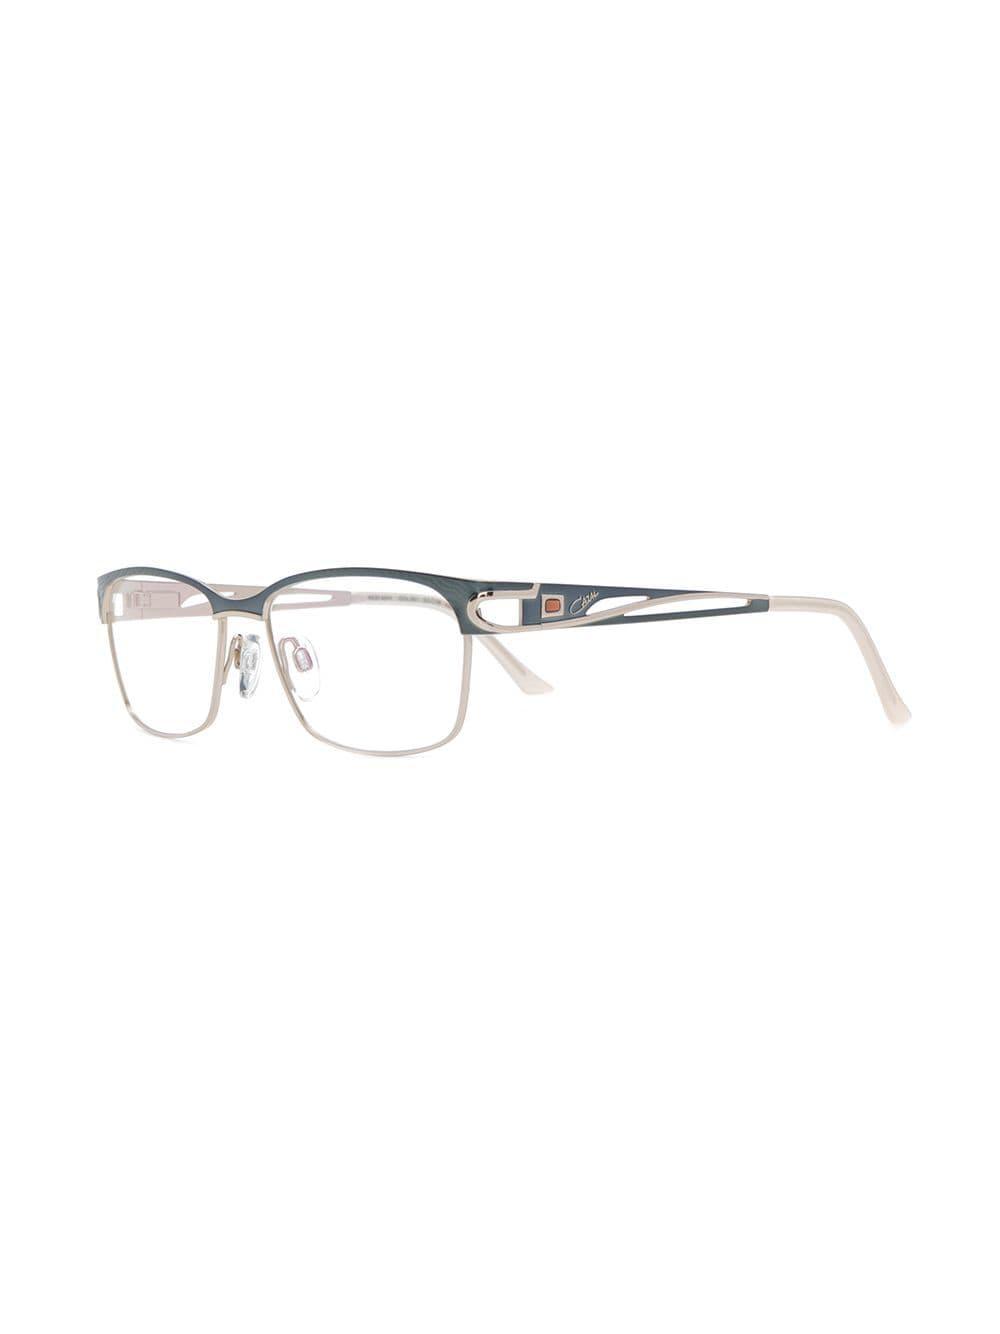 1b9aeec1a8e4 Cazal Rectangle Frame Glasses - Lyst